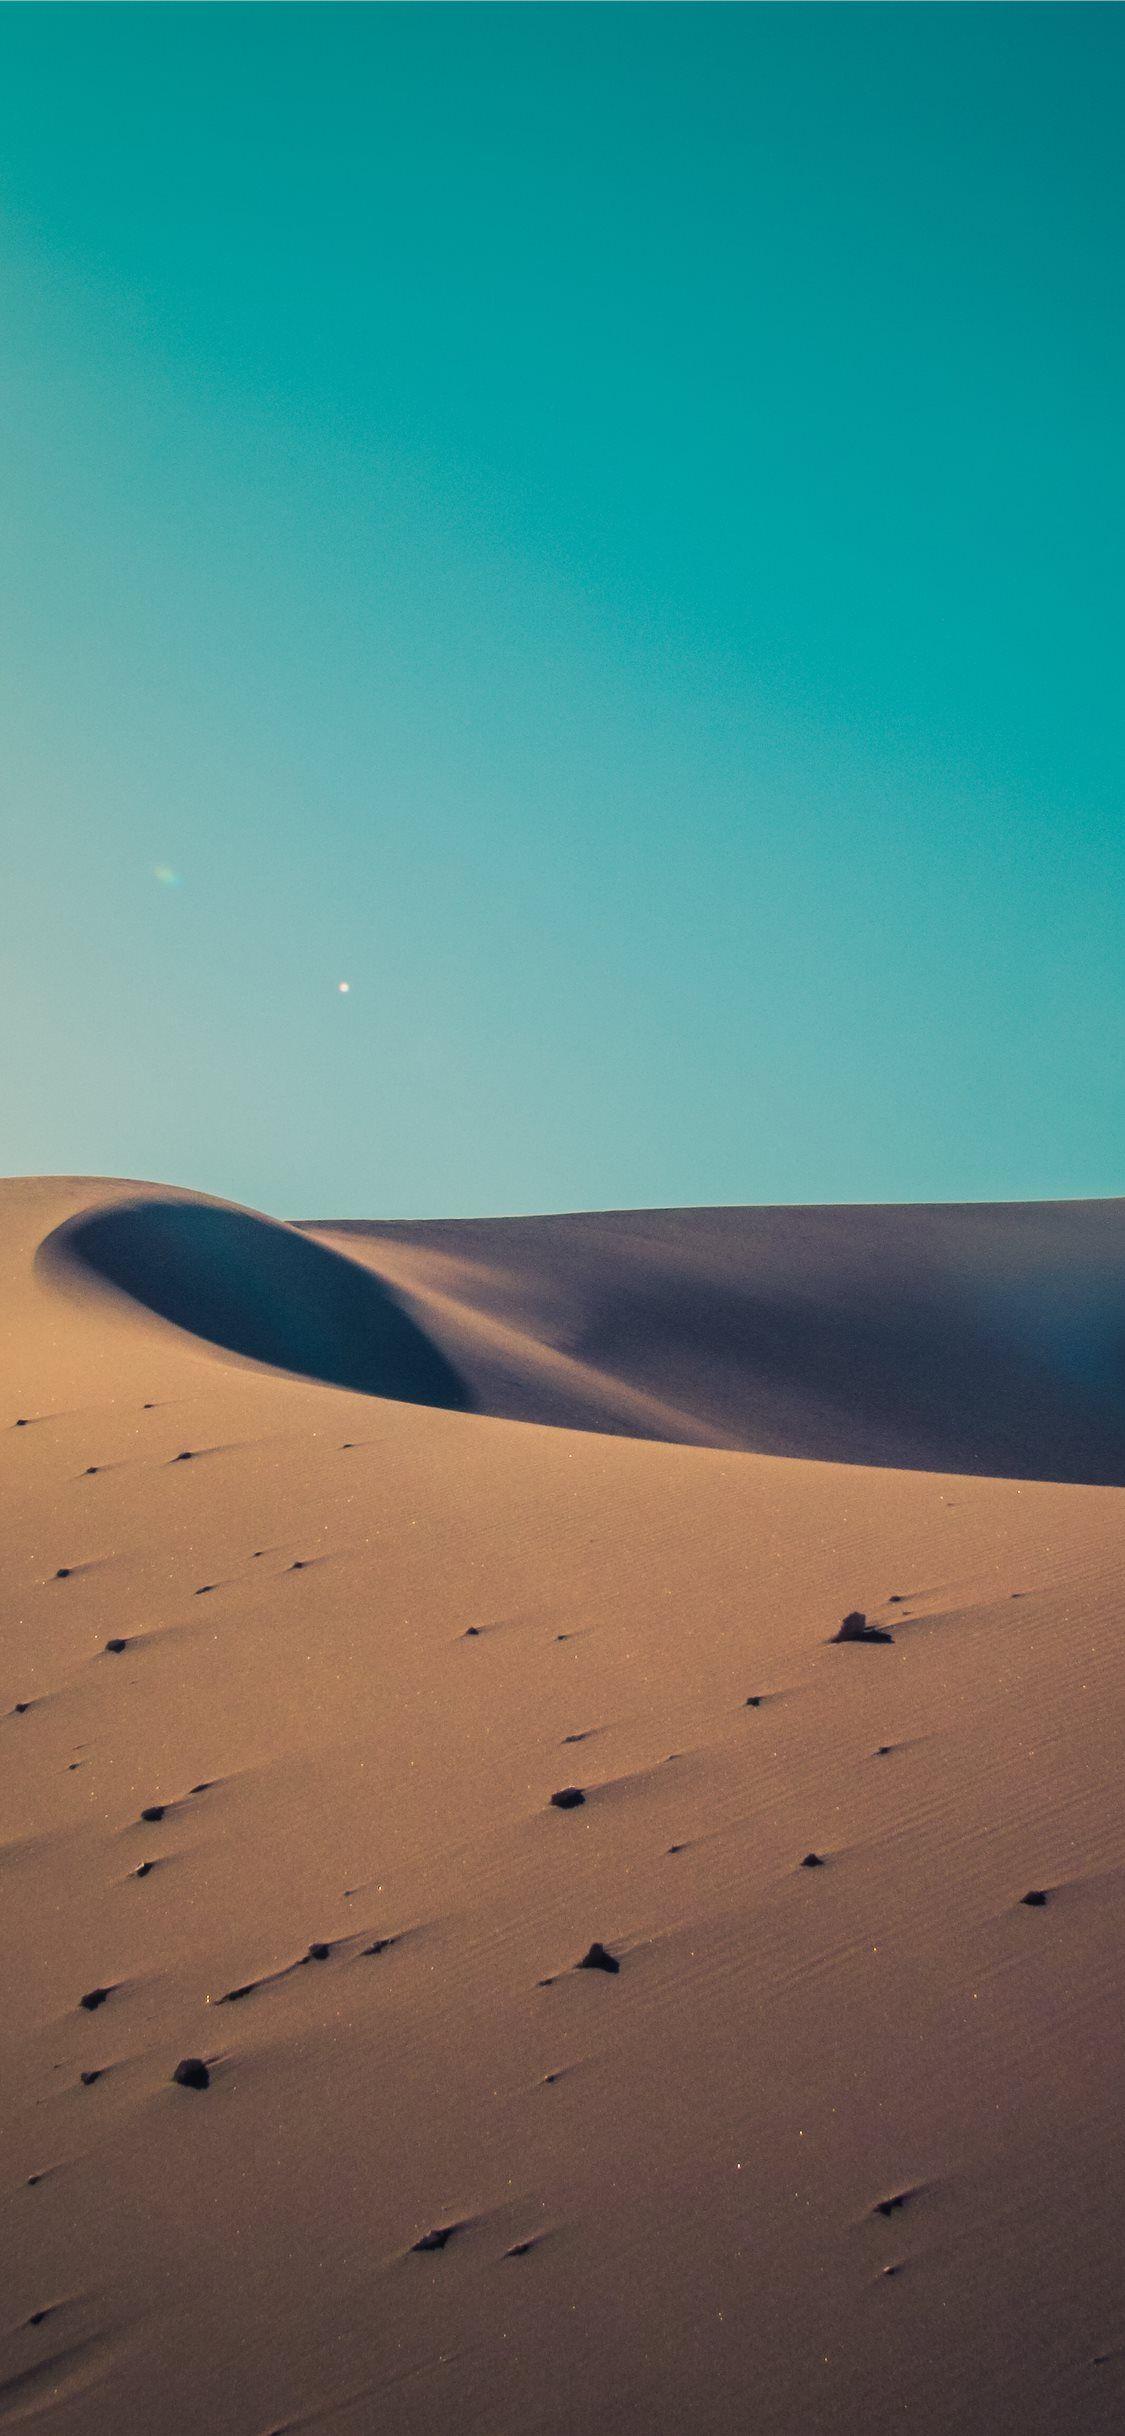 desert during day in 2020 Cool wallpaper, Wallpaper